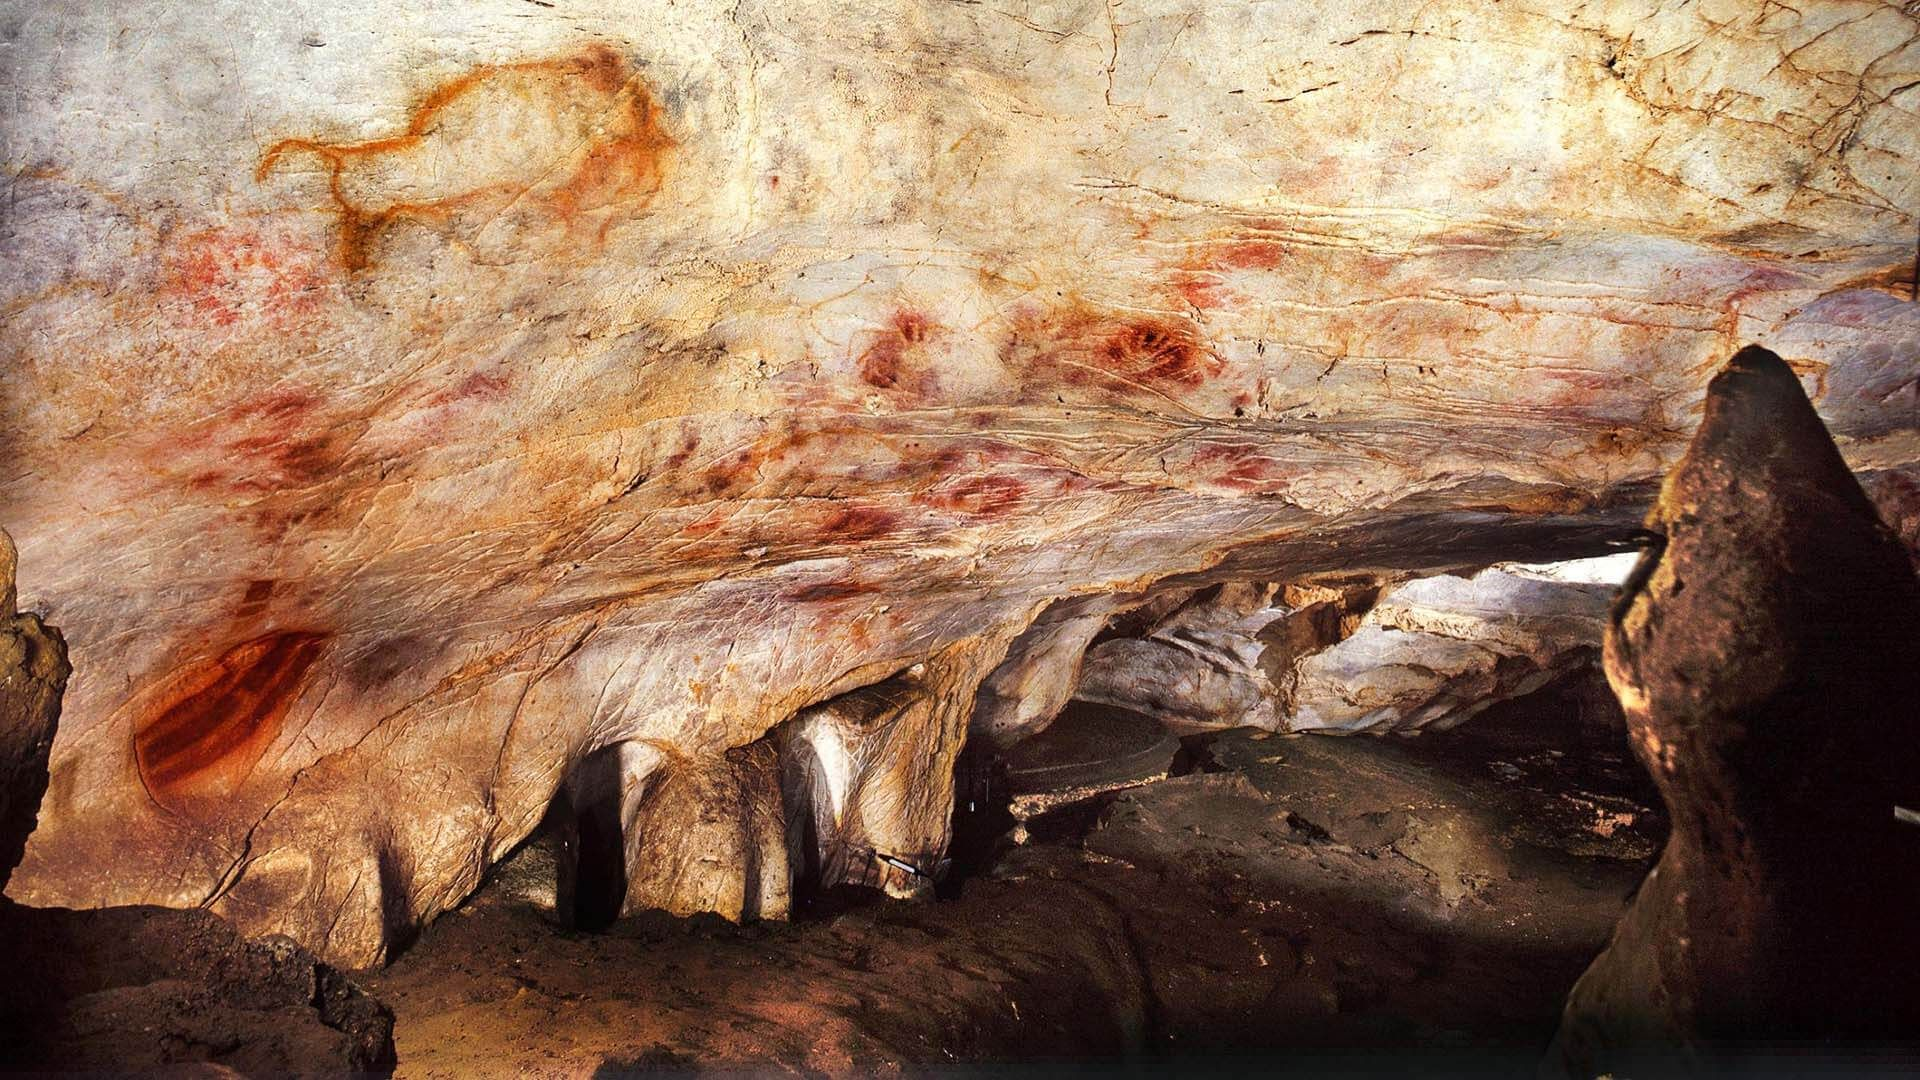 El Castillo Mağarası, İspanya